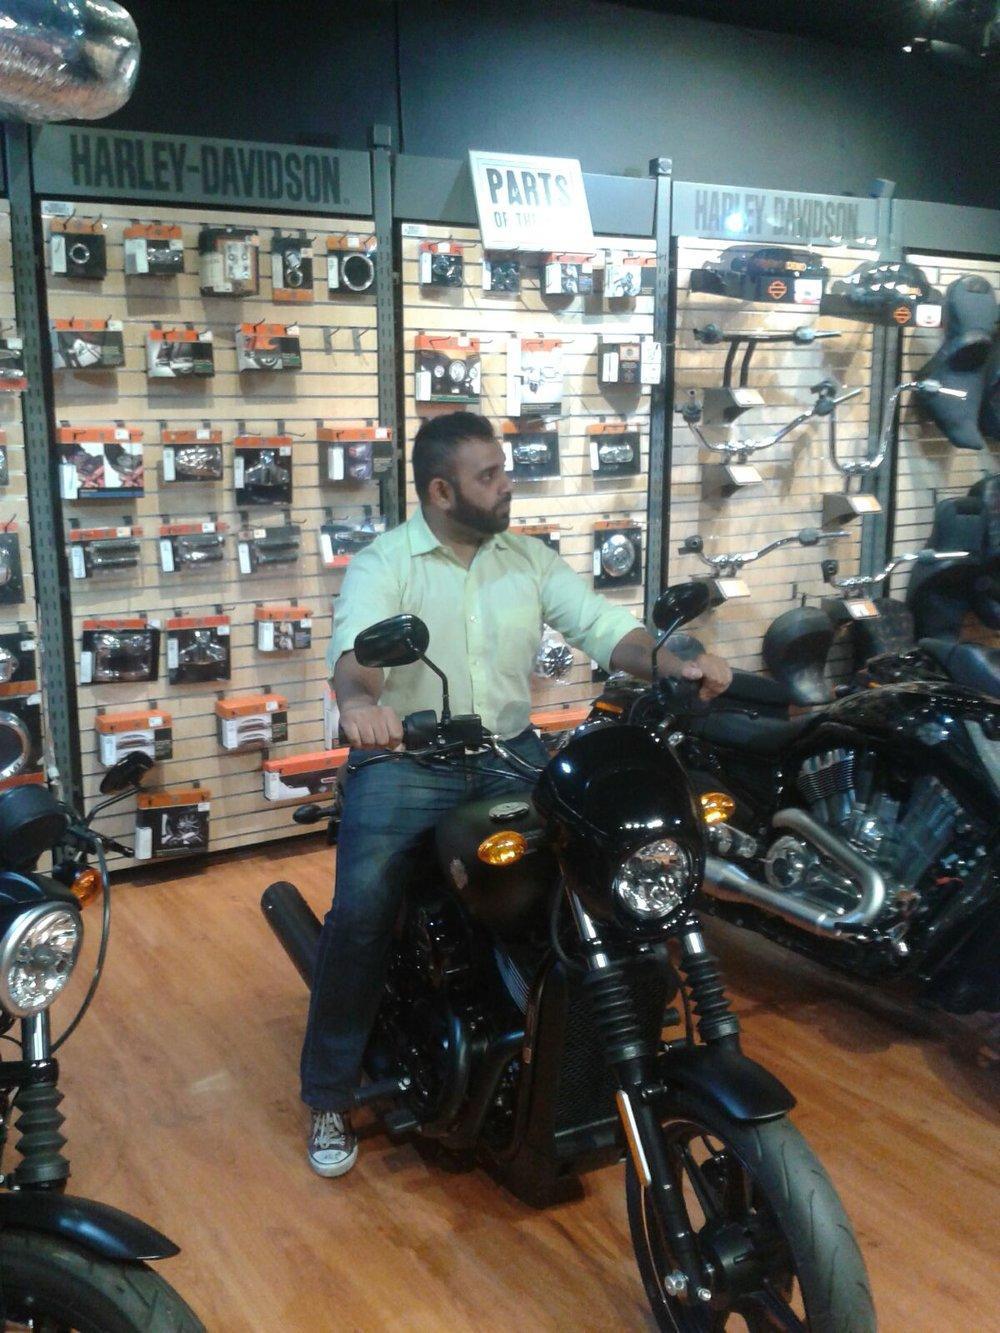 Me on a Harley Davidson Street 750, Harley Davidson Johannesburg. Photo by Mike Myburgh, 5 February 2016